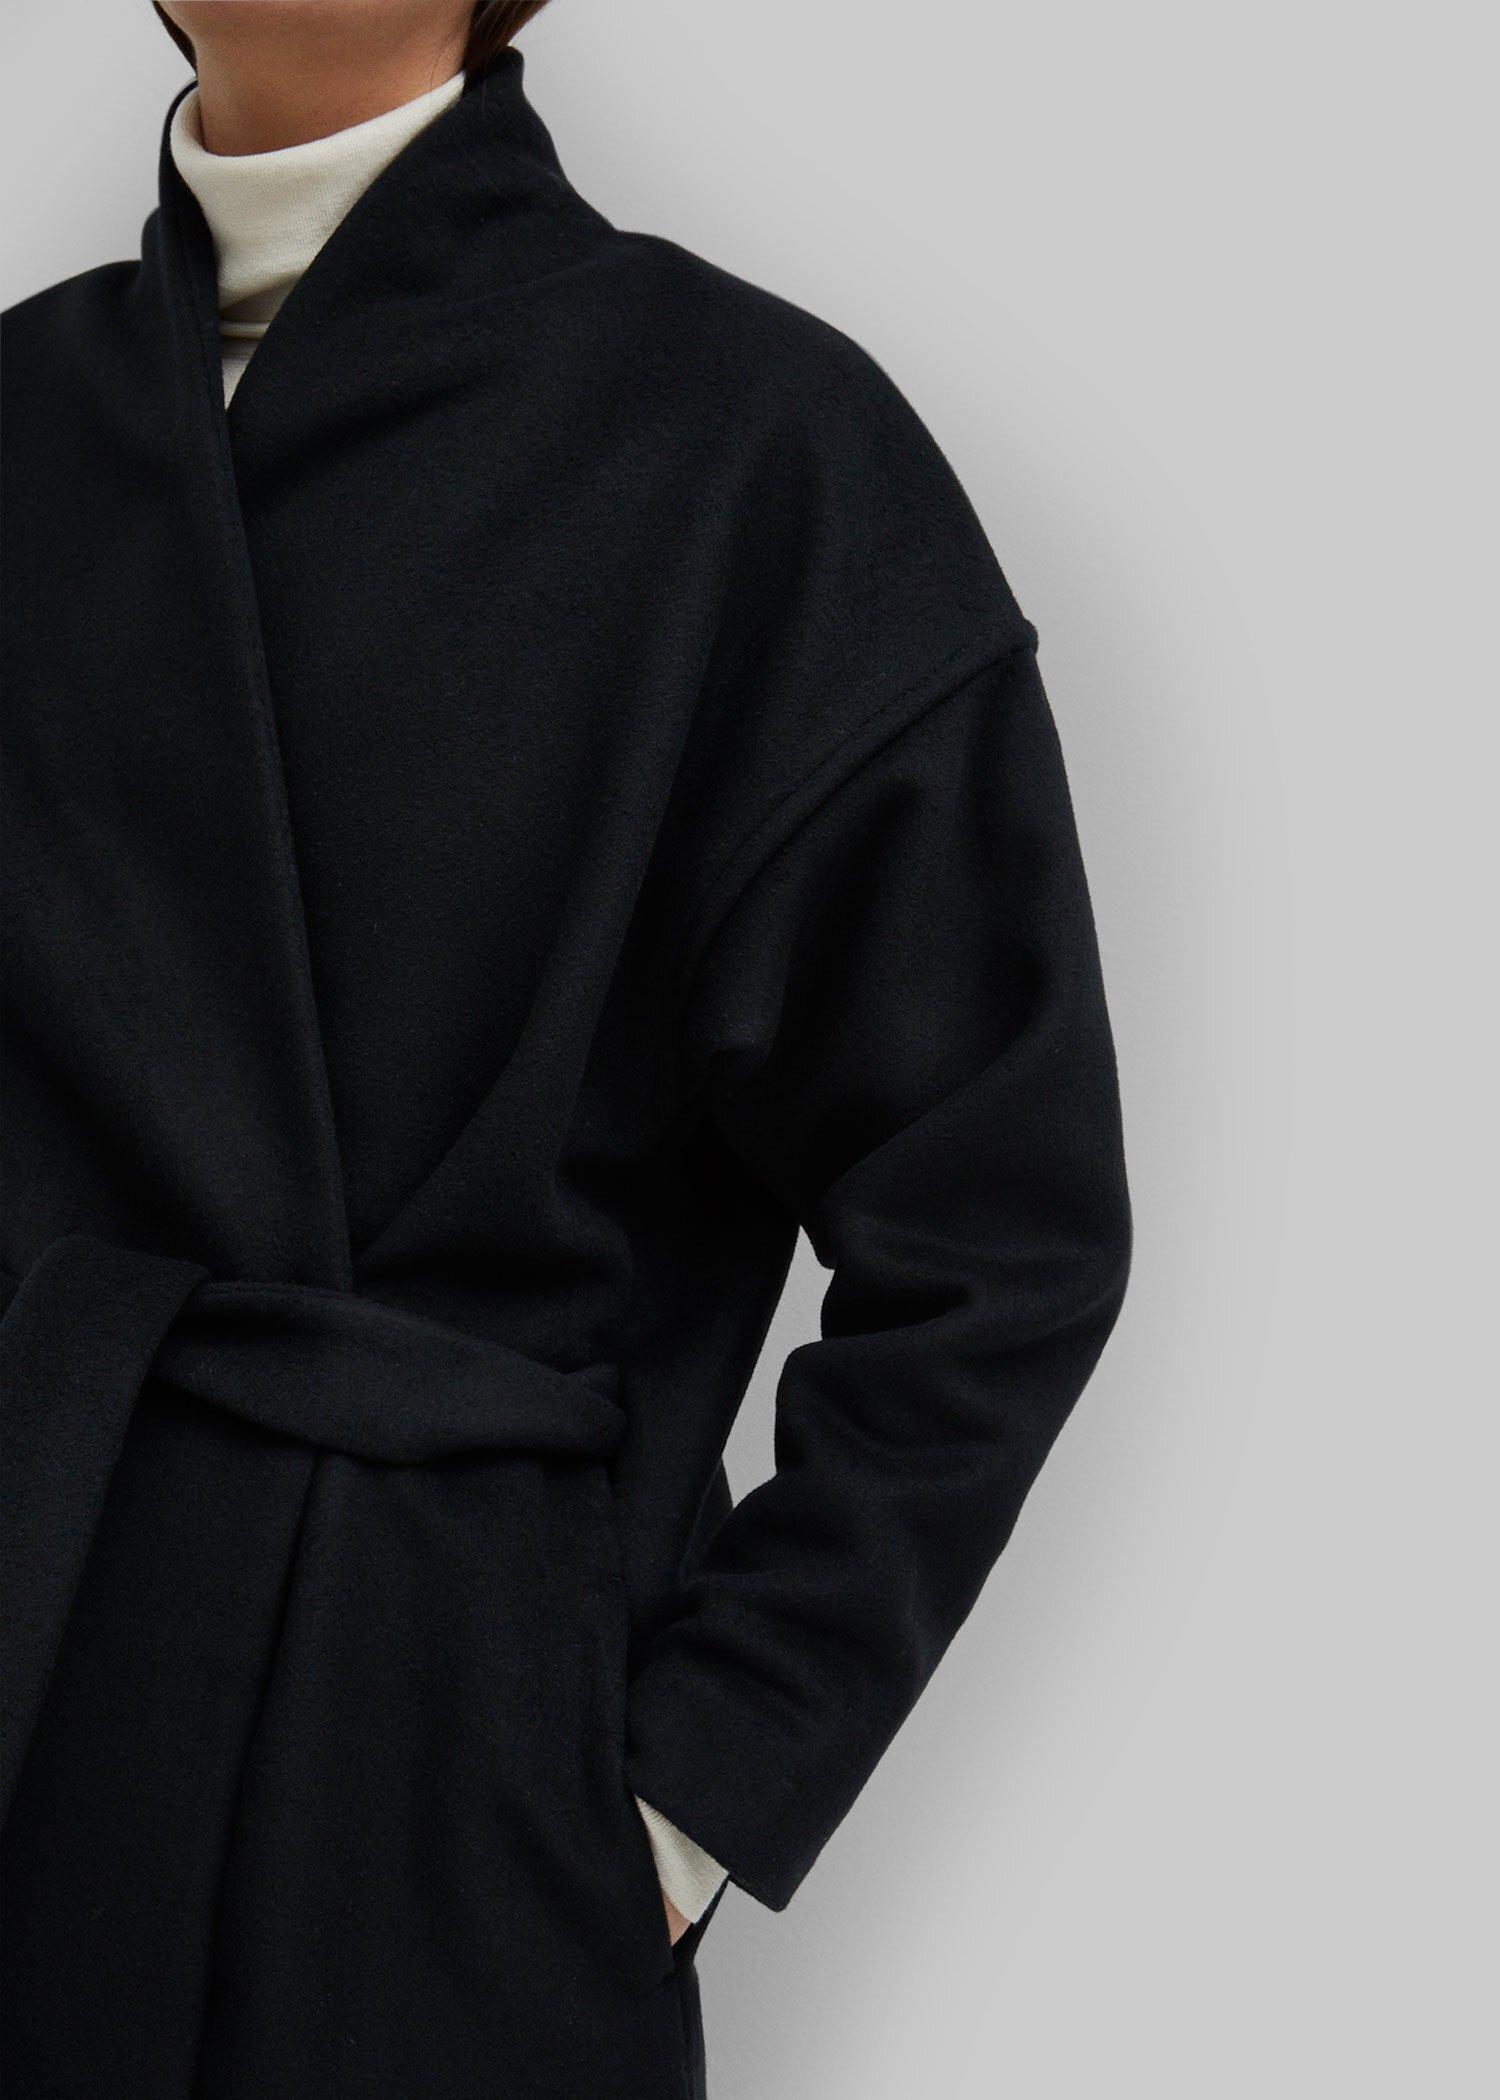 16_toteme_-fw19_chelsea_coat_black_035.jpg